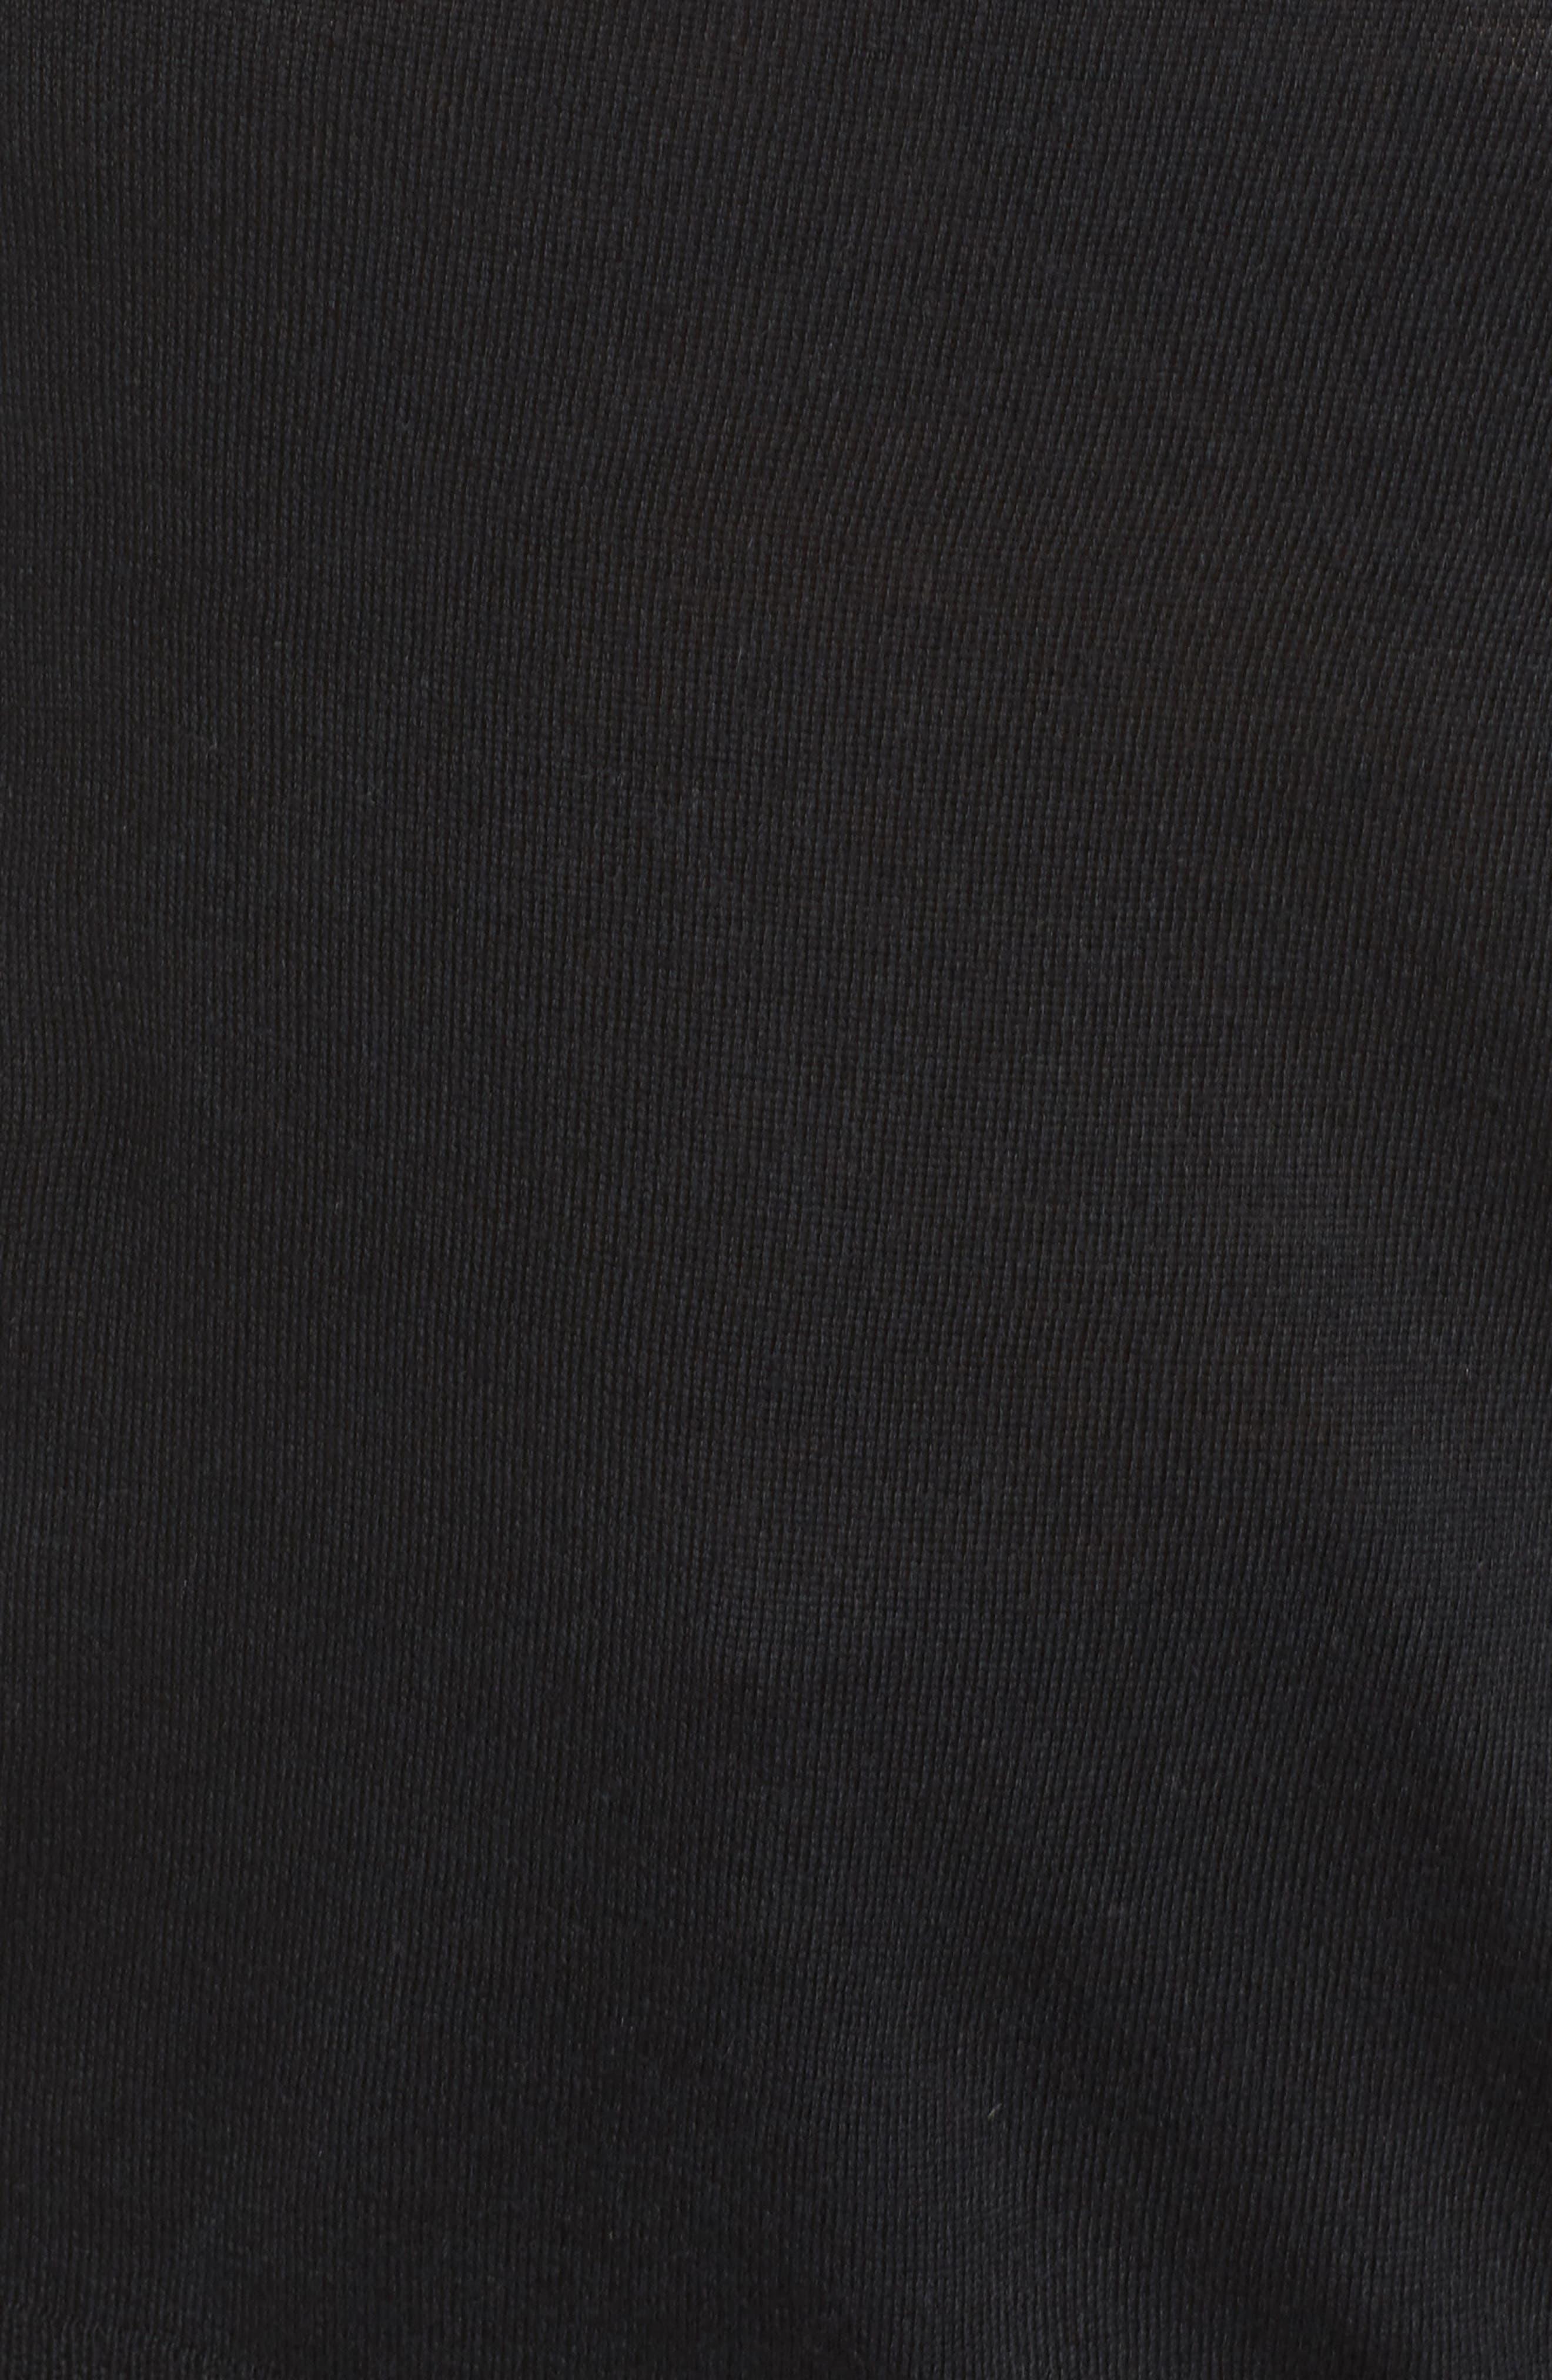 Merino Wool Blend Turtleneck Sweater,                             Alternate thumbnail 5, color,                             Black